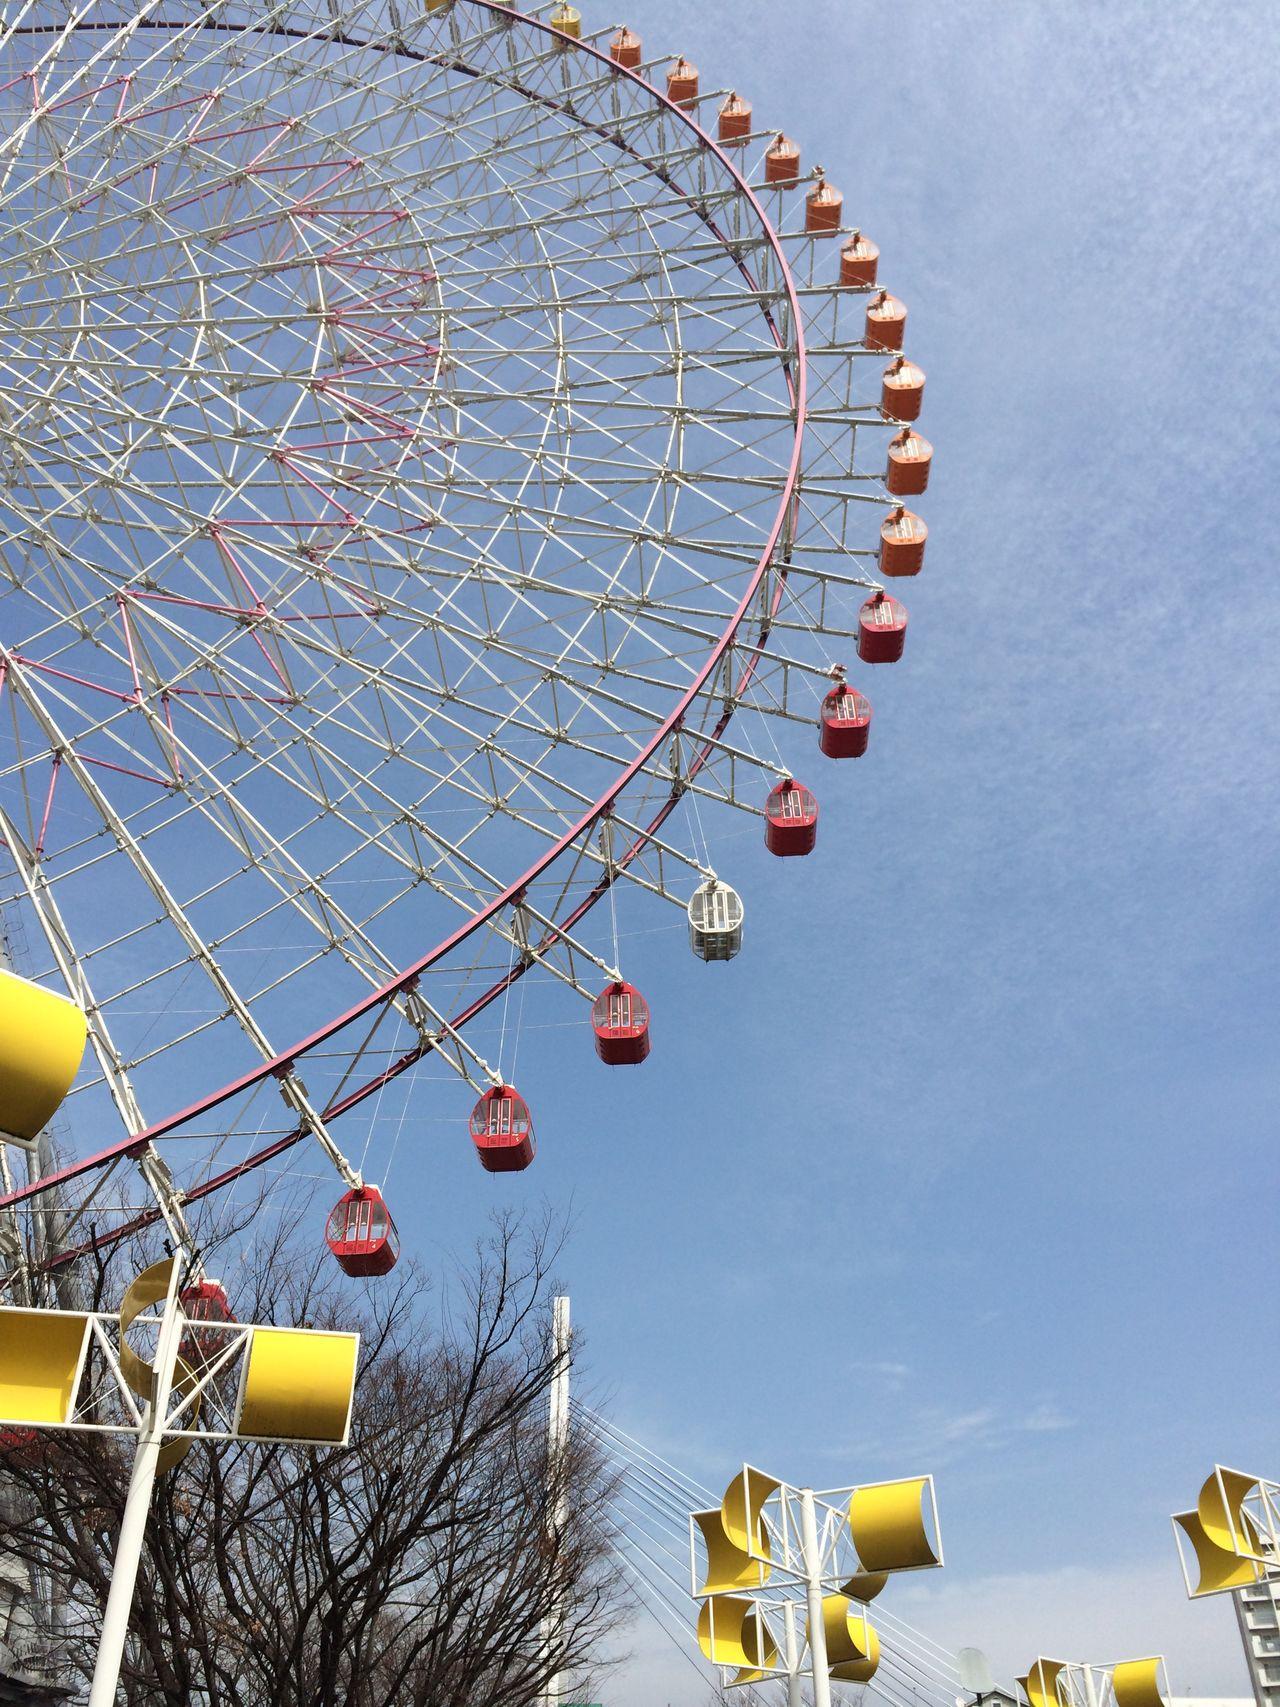 Tempozan Ferris Wheel in Osaka Day Ferris Wheel Low Angle View No People OSAKA Osaka,Japan Outdoors Red Sky Tempozan Ferris Wheel Travel Travel Photography White Yellow 관람차 Iphone5s